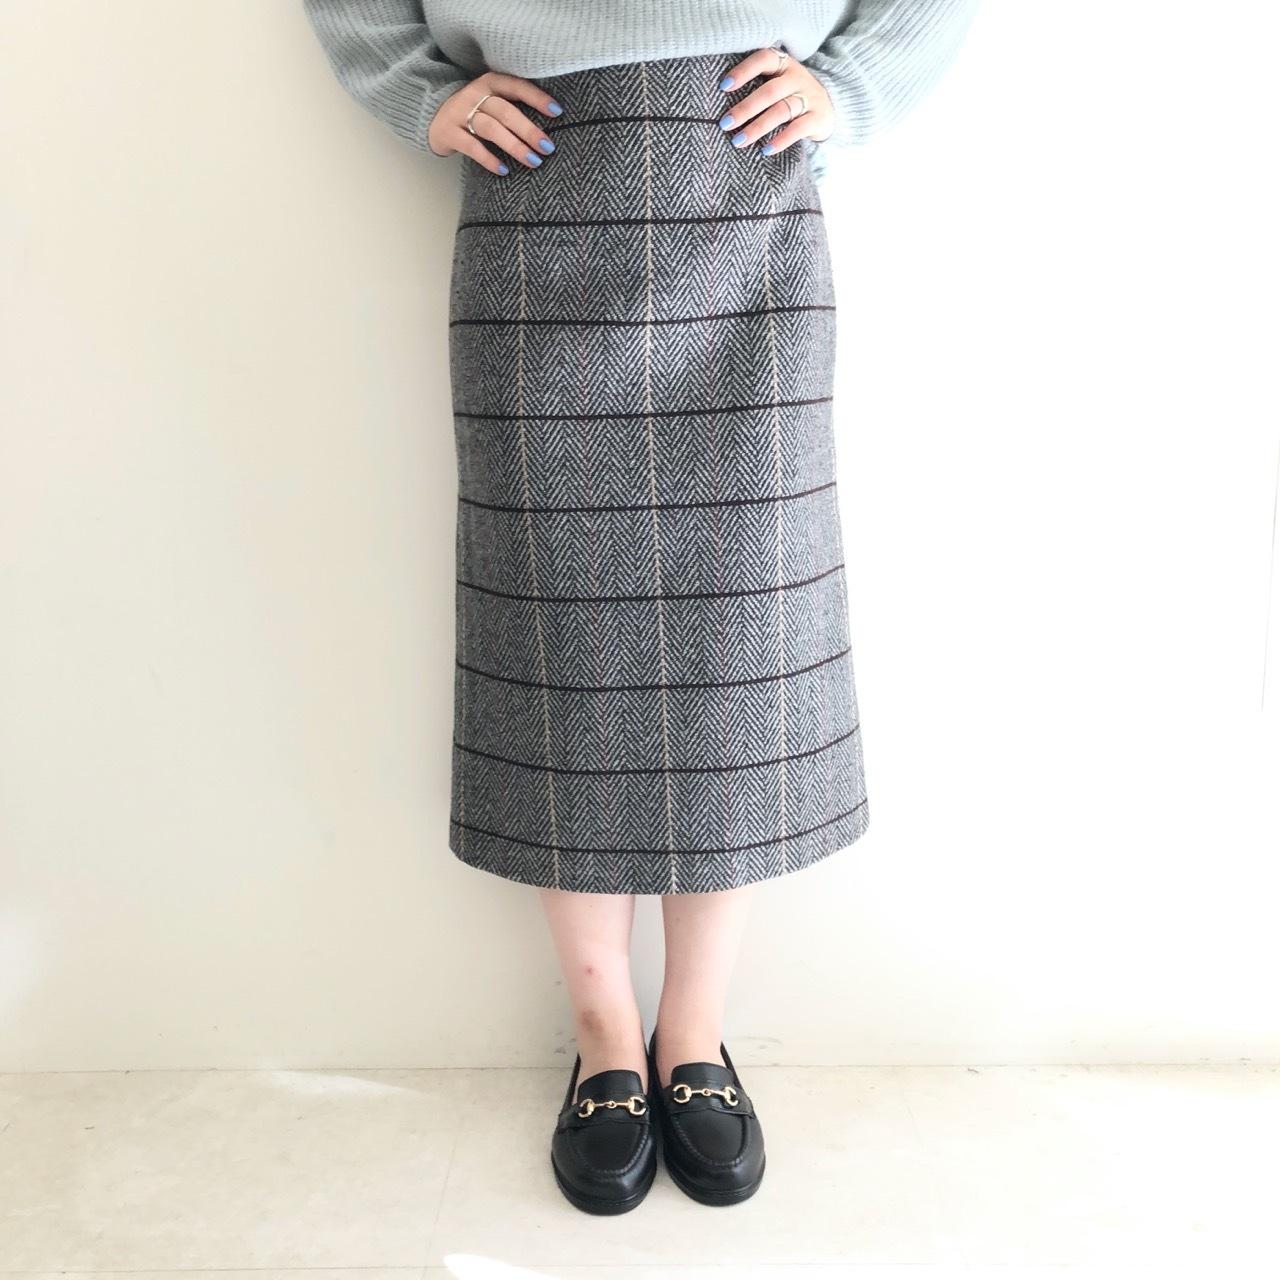 【 anana 】- n19a837 - ヘリンボーンチェックスカート